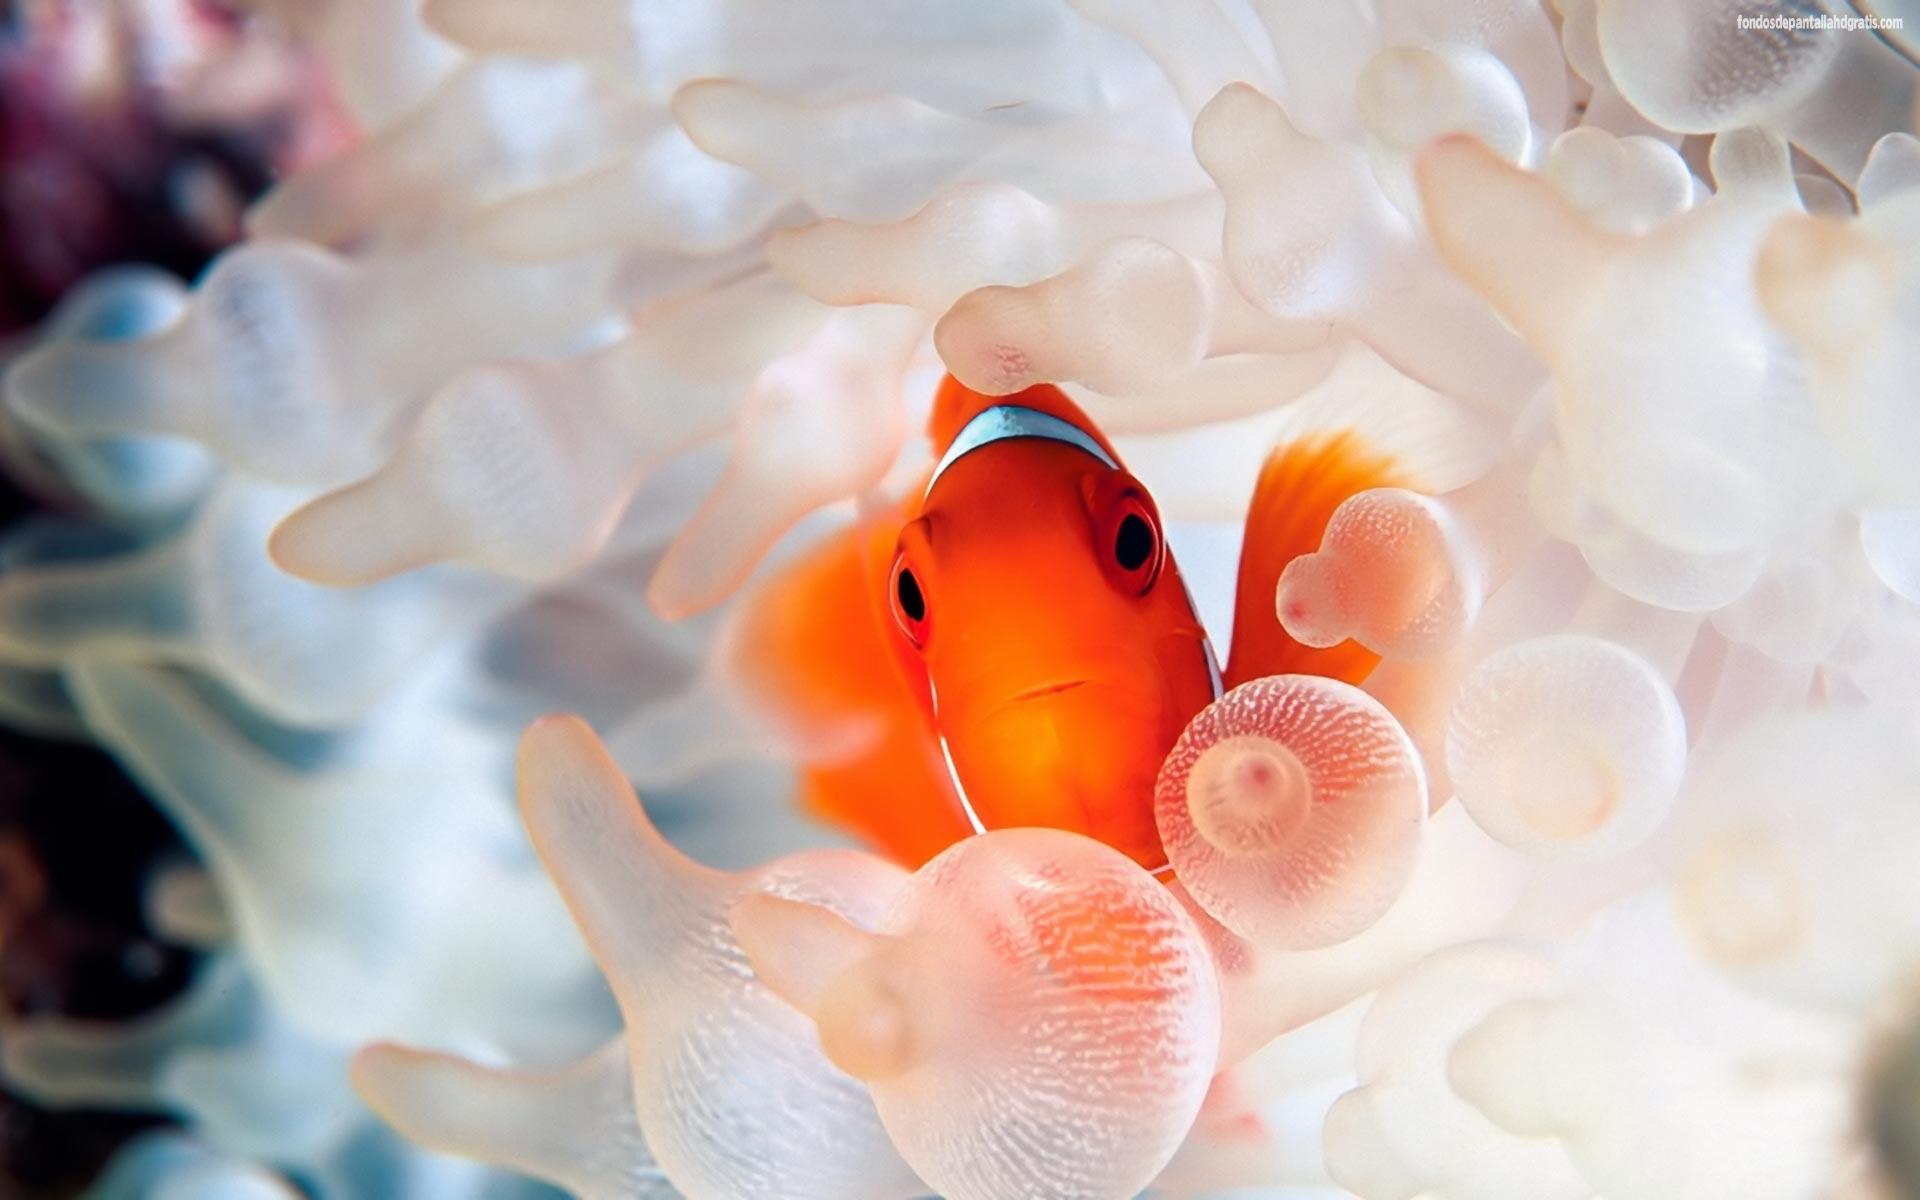 coral reef fish desktop wallpaper hd widescreen Gratis 20880 1920x1200